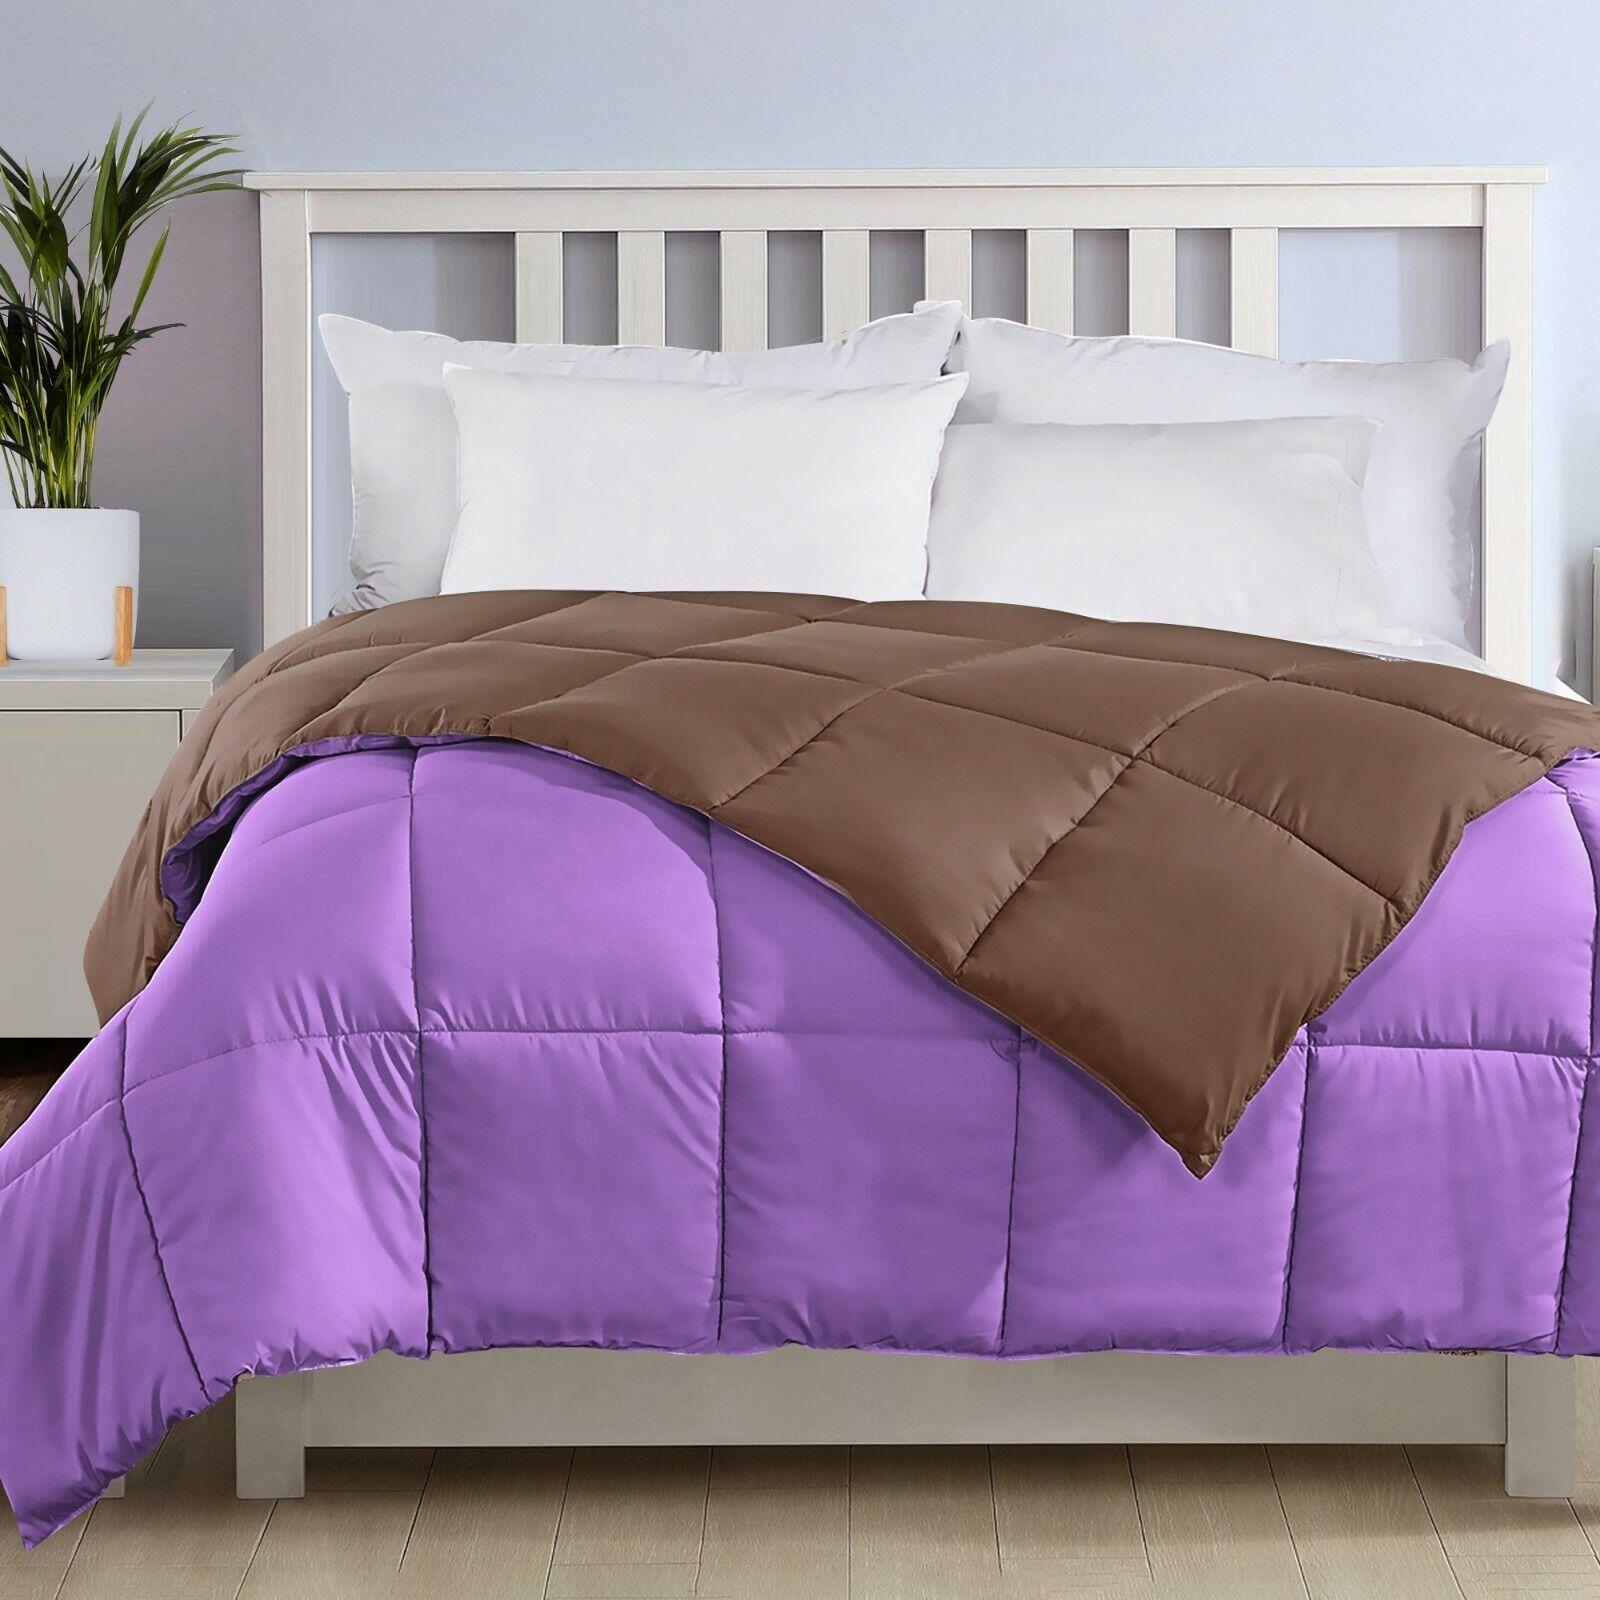 Ultra Soft Down Alternative Comforter Quilted Duvet Insert All Season Ebay